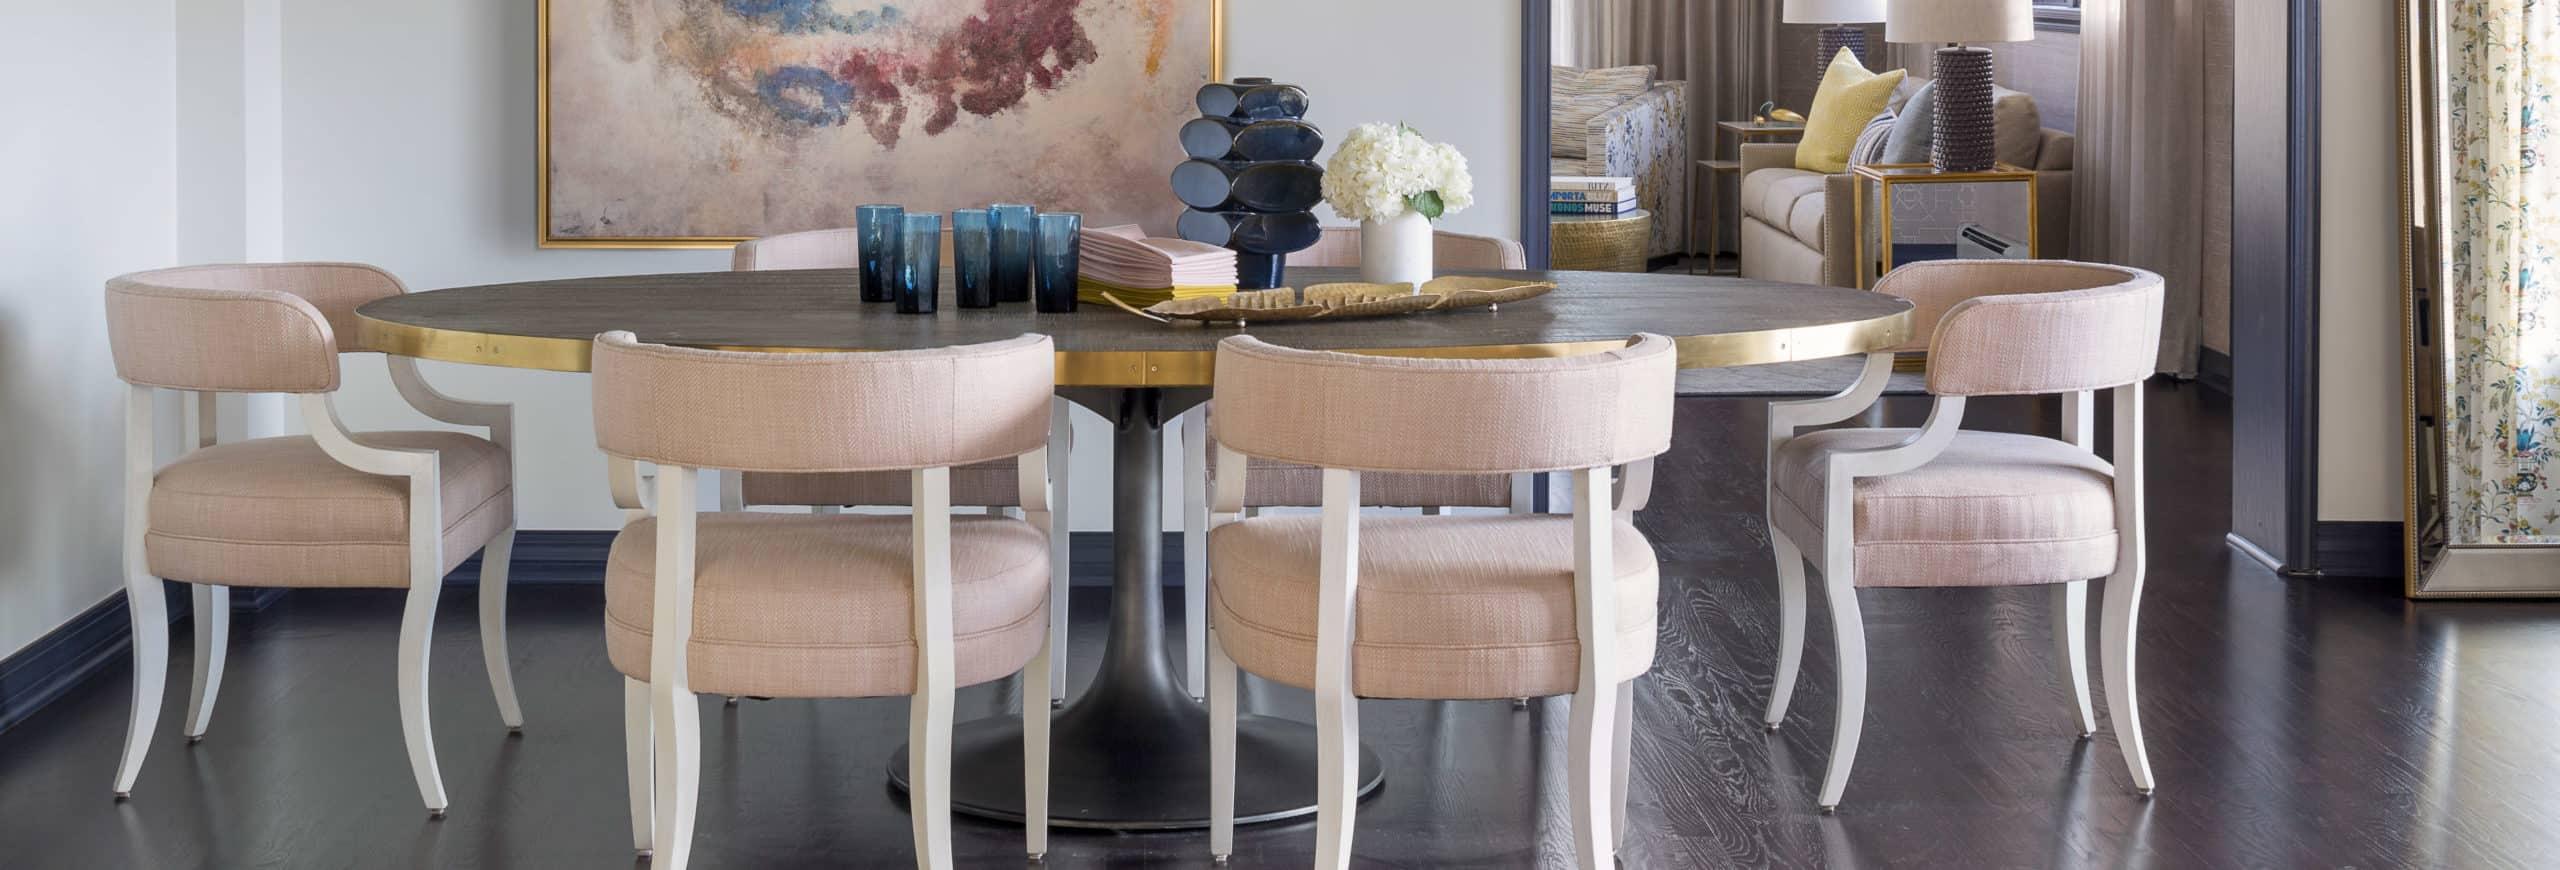 Ultra modern dining room on Houzz